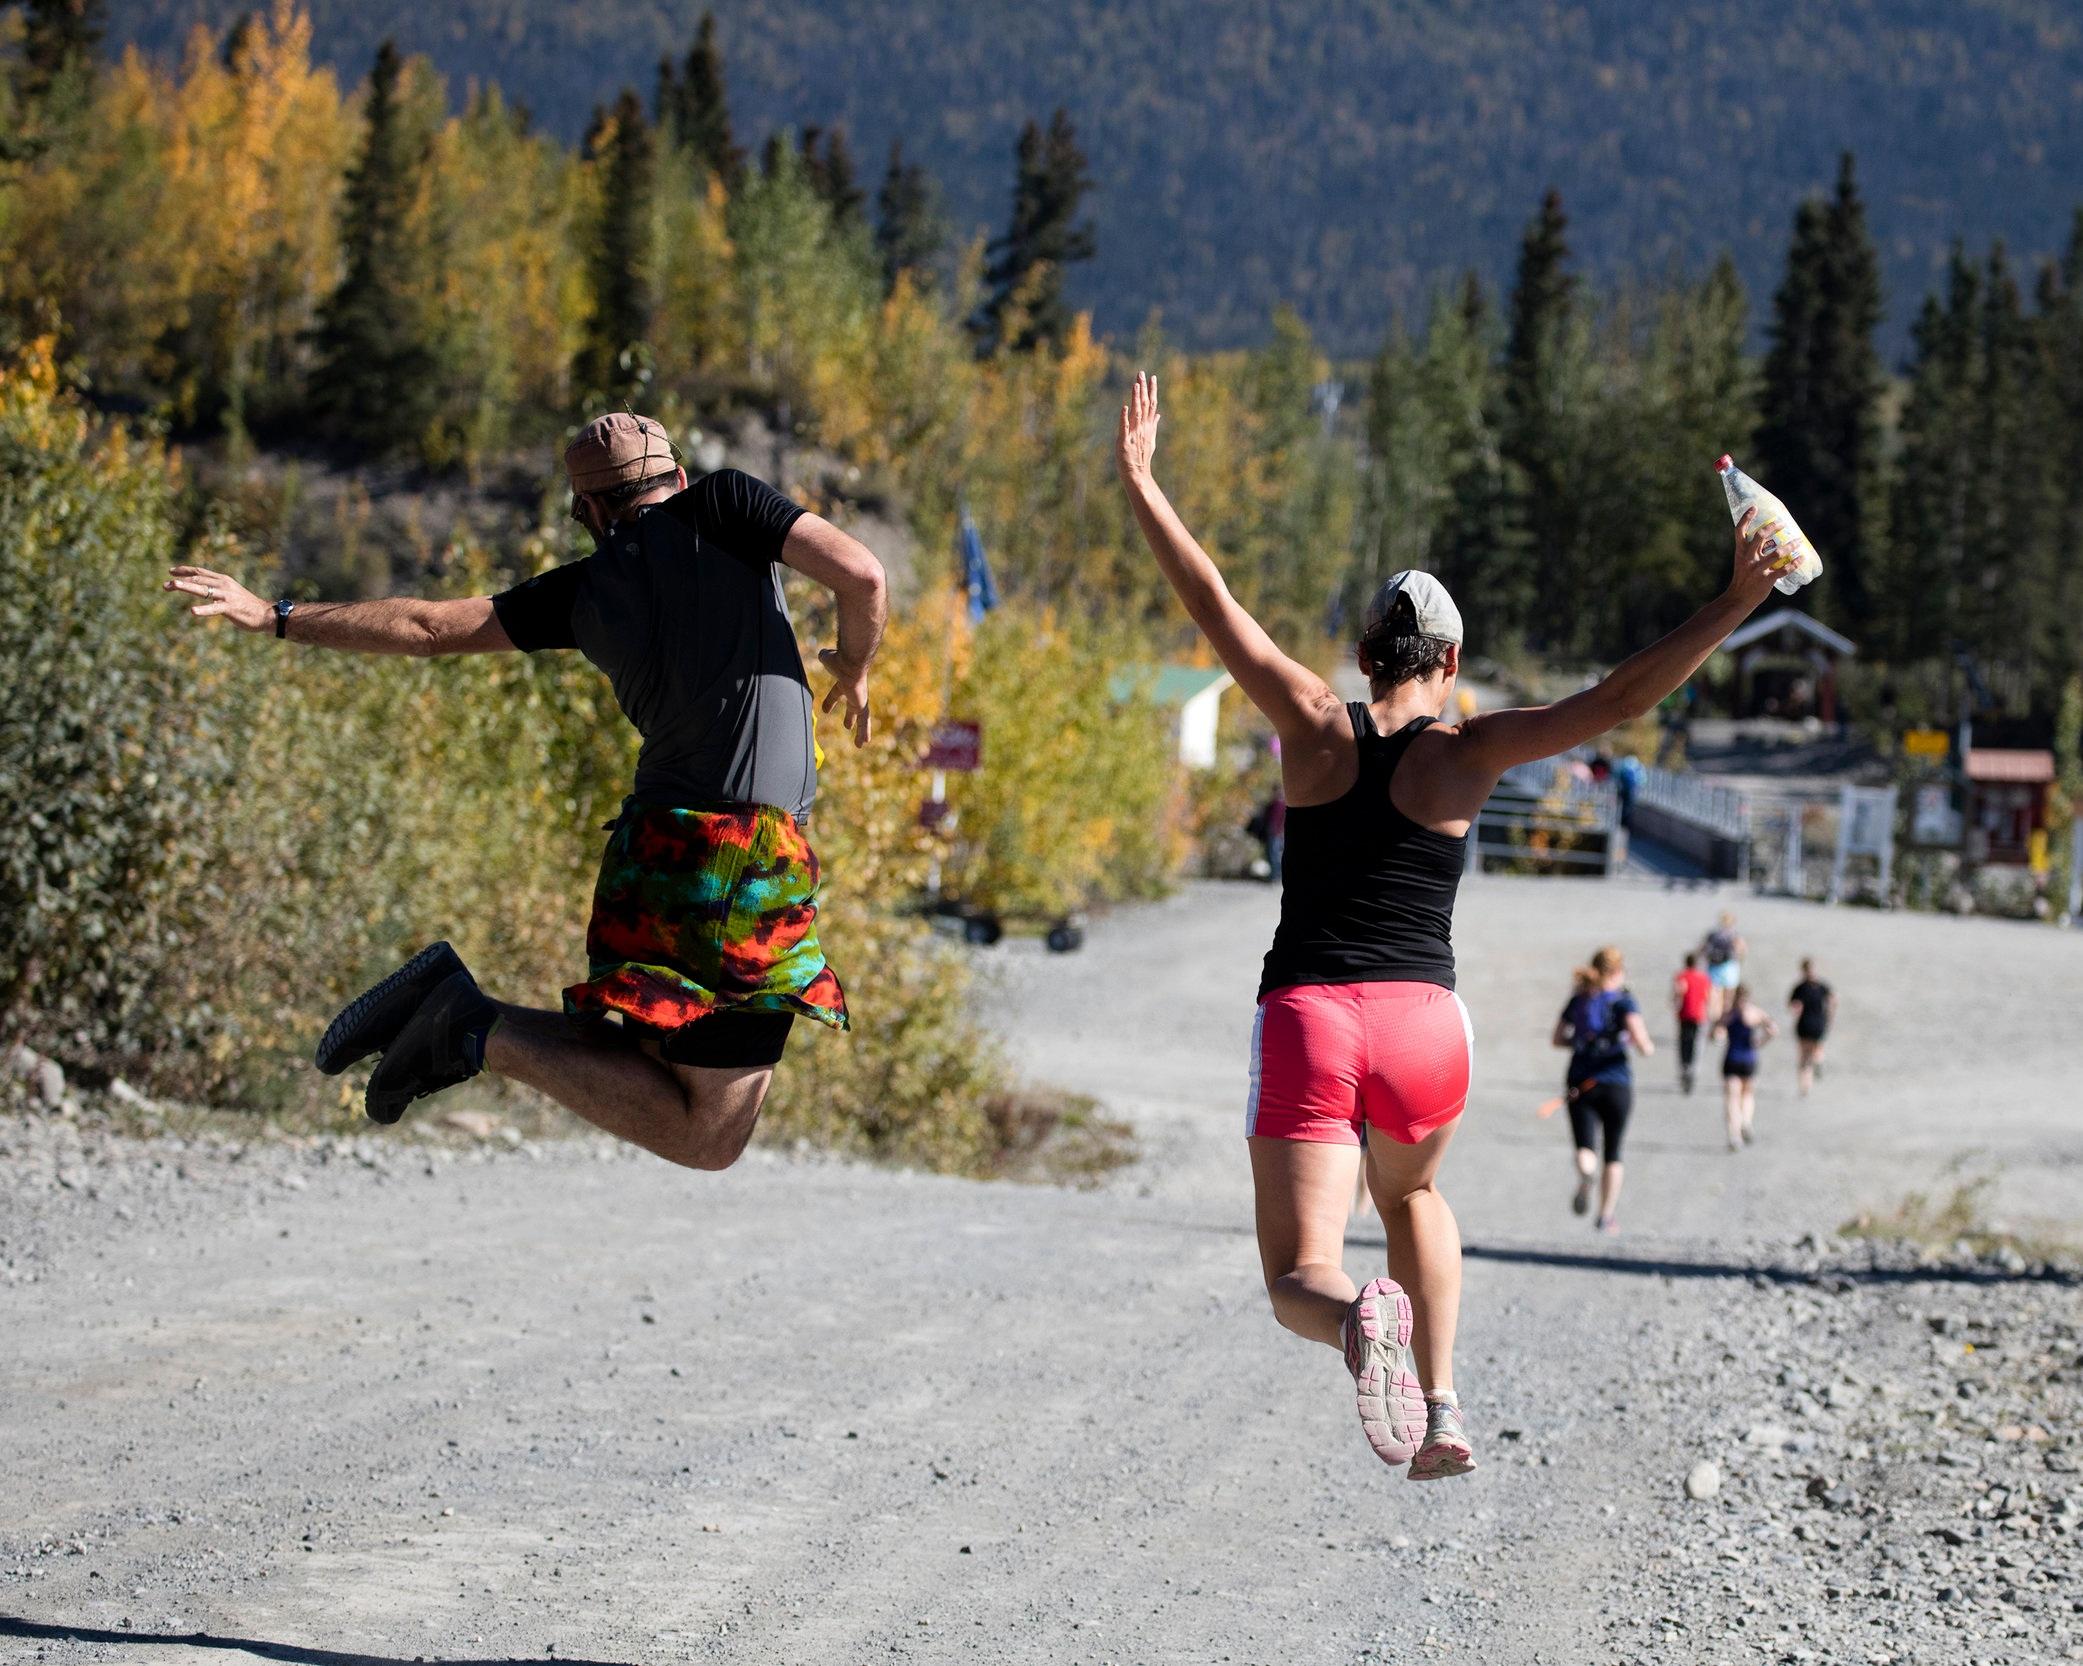 Runners in the McCarthy Marathon near the half-way point in Kennicott